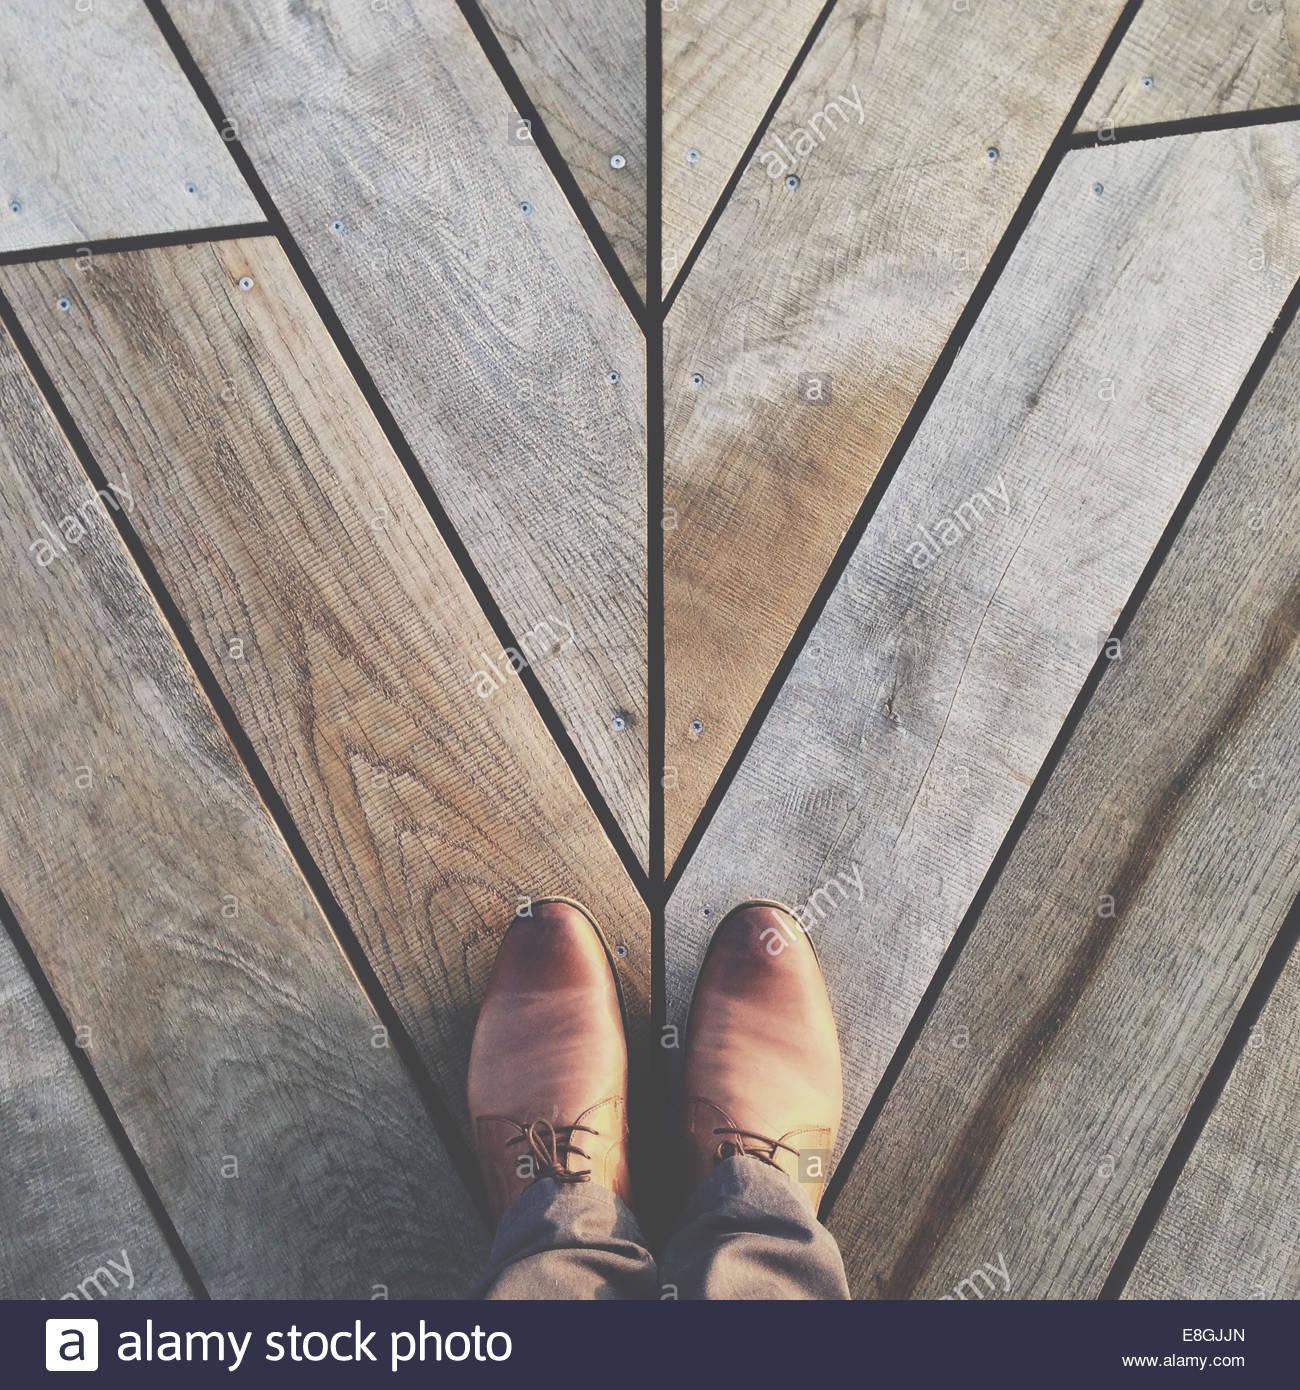 Feet on hardwood floor - Stock Image